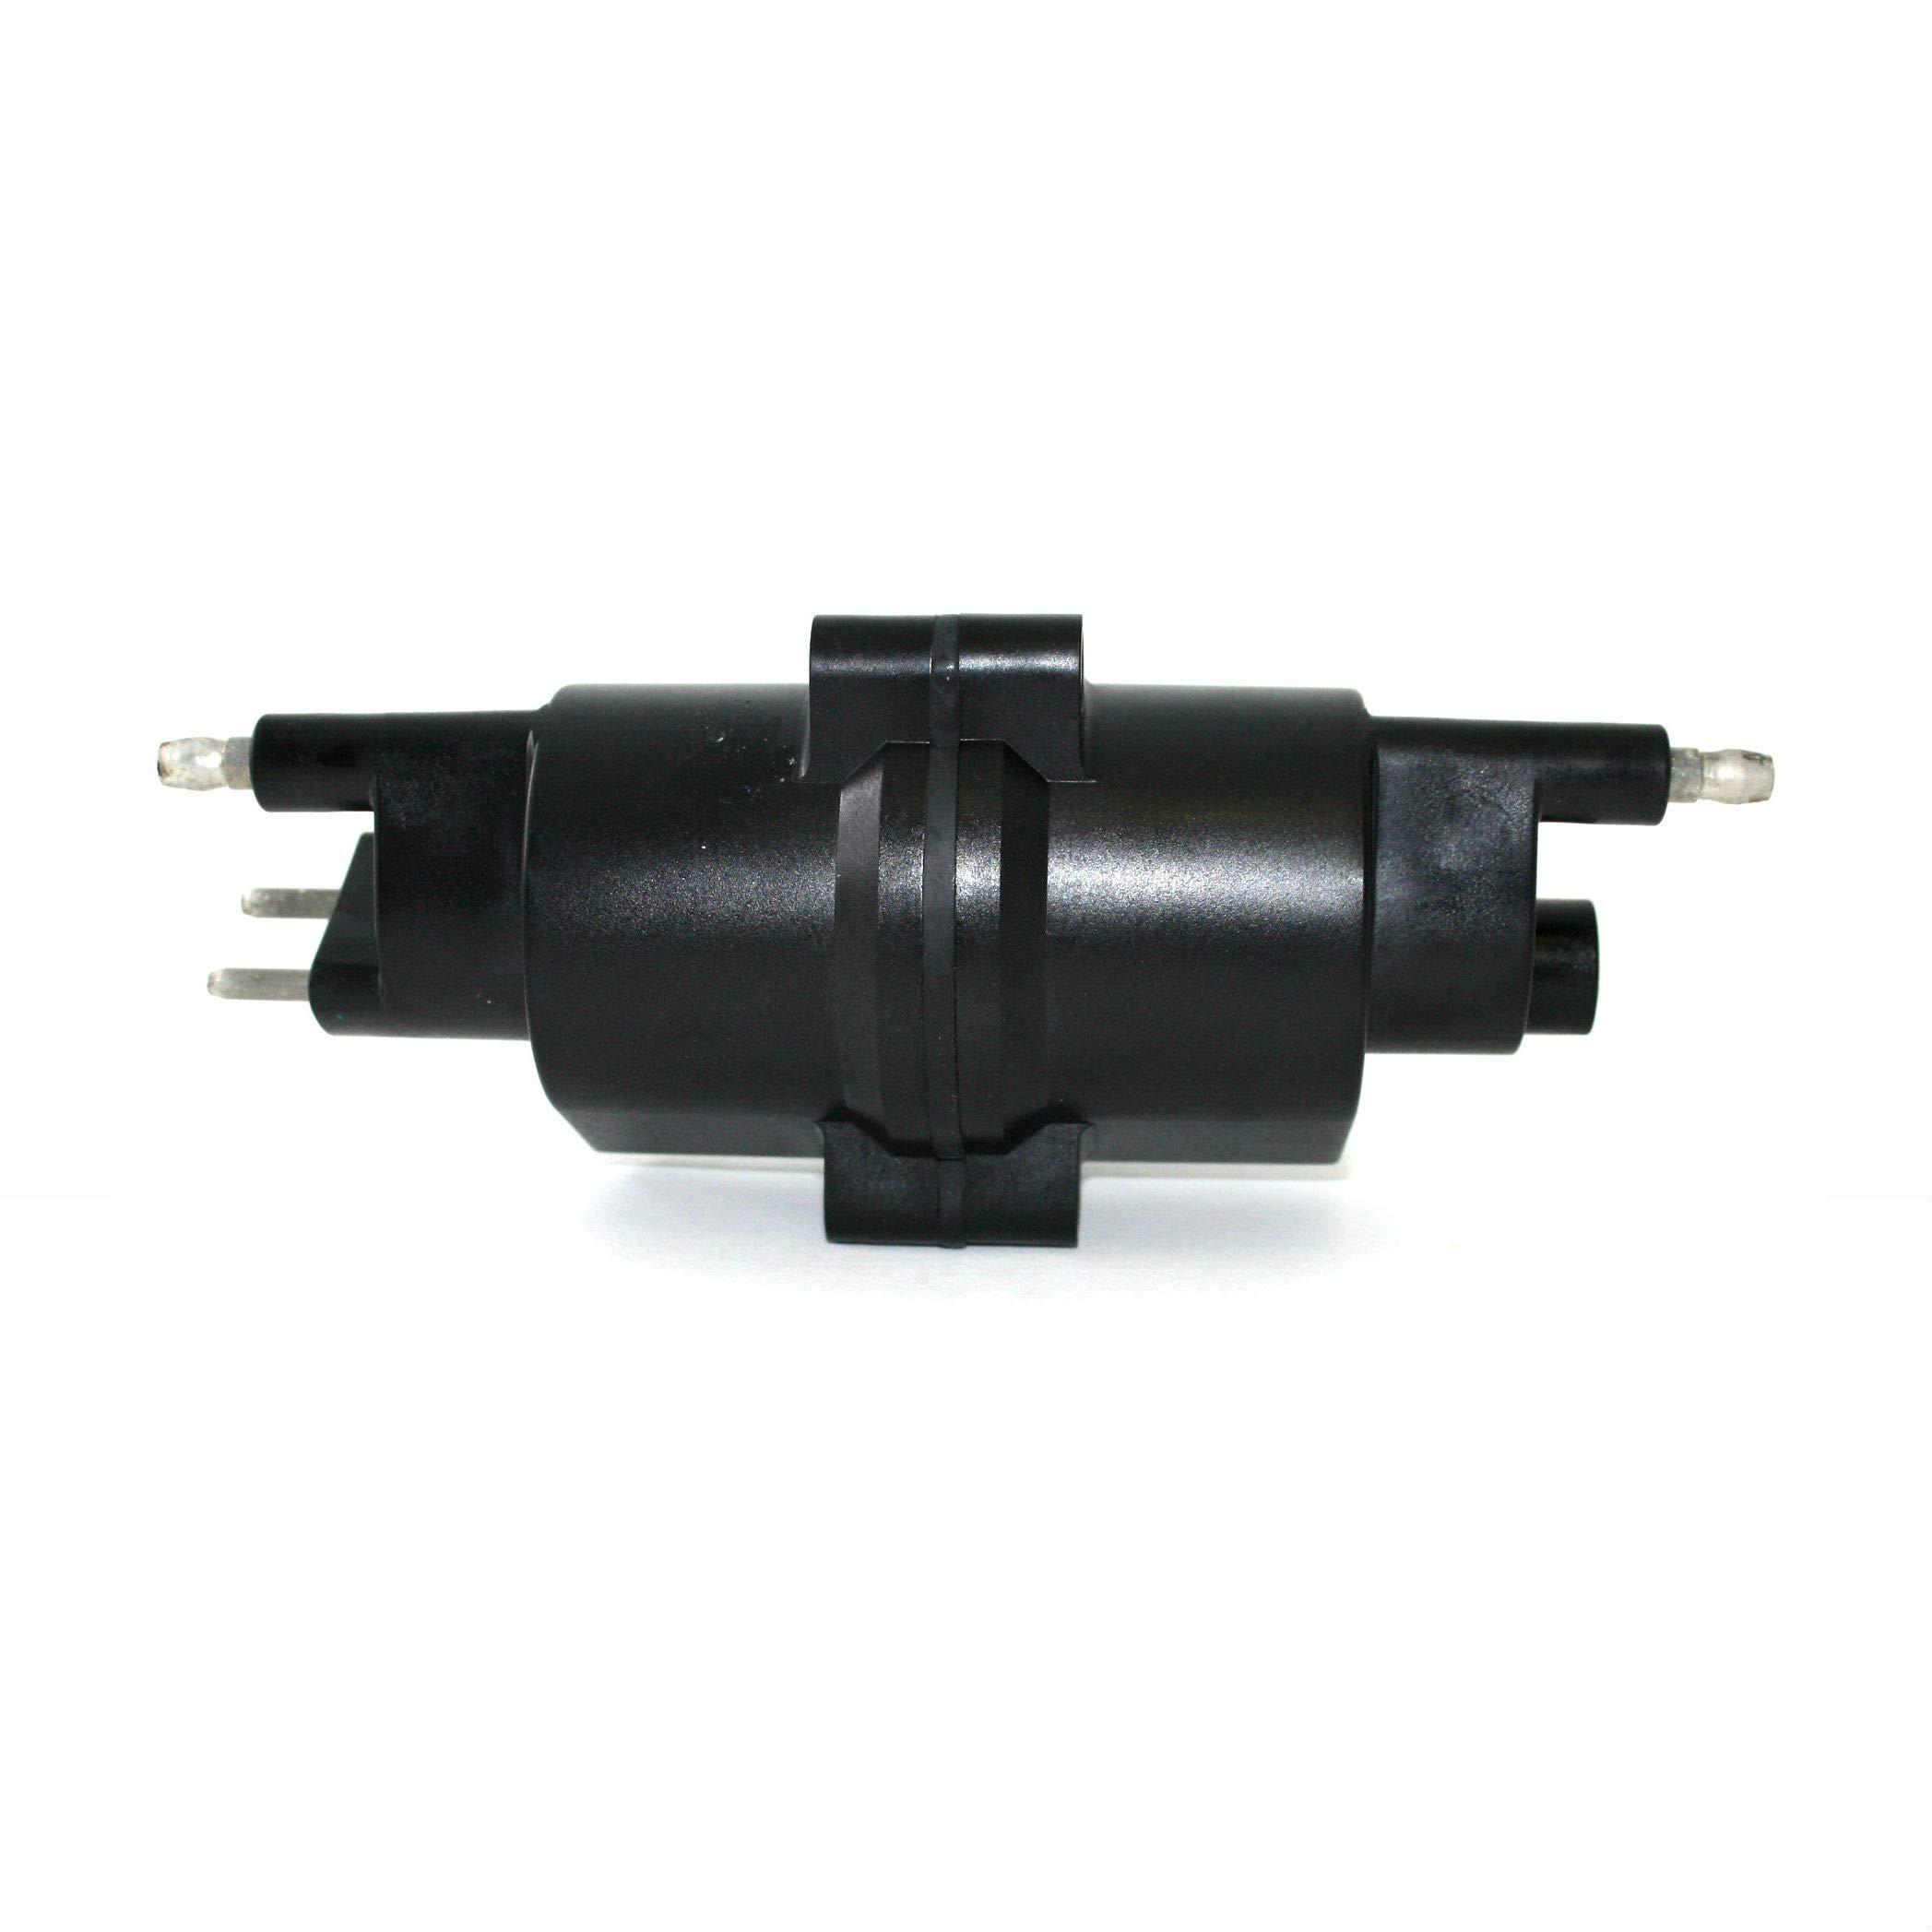 LUCAS Ignition Coil DLB222 12V 2CV TWOCV 2 CV